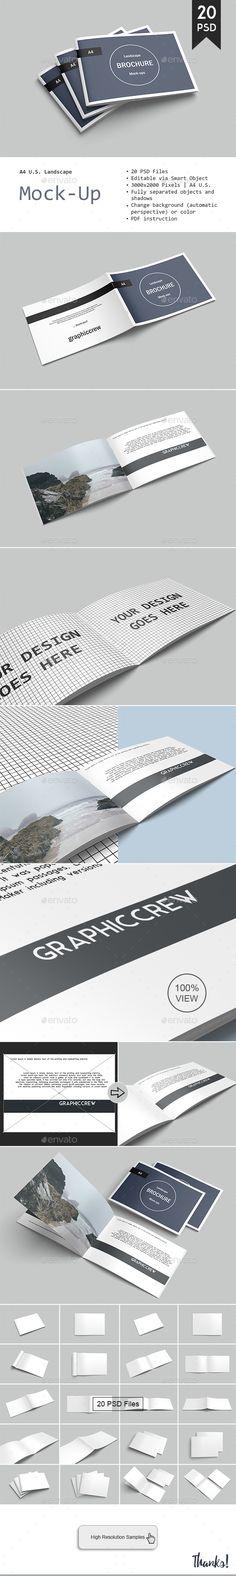 Landscape Brochure Mockup   #A4 #landscape #brochure #mockup #mockups #magazine #graphicdesign #graphic #design #preview #cover #297x210 #display #photoshop #print #inside #photo #Modern #render